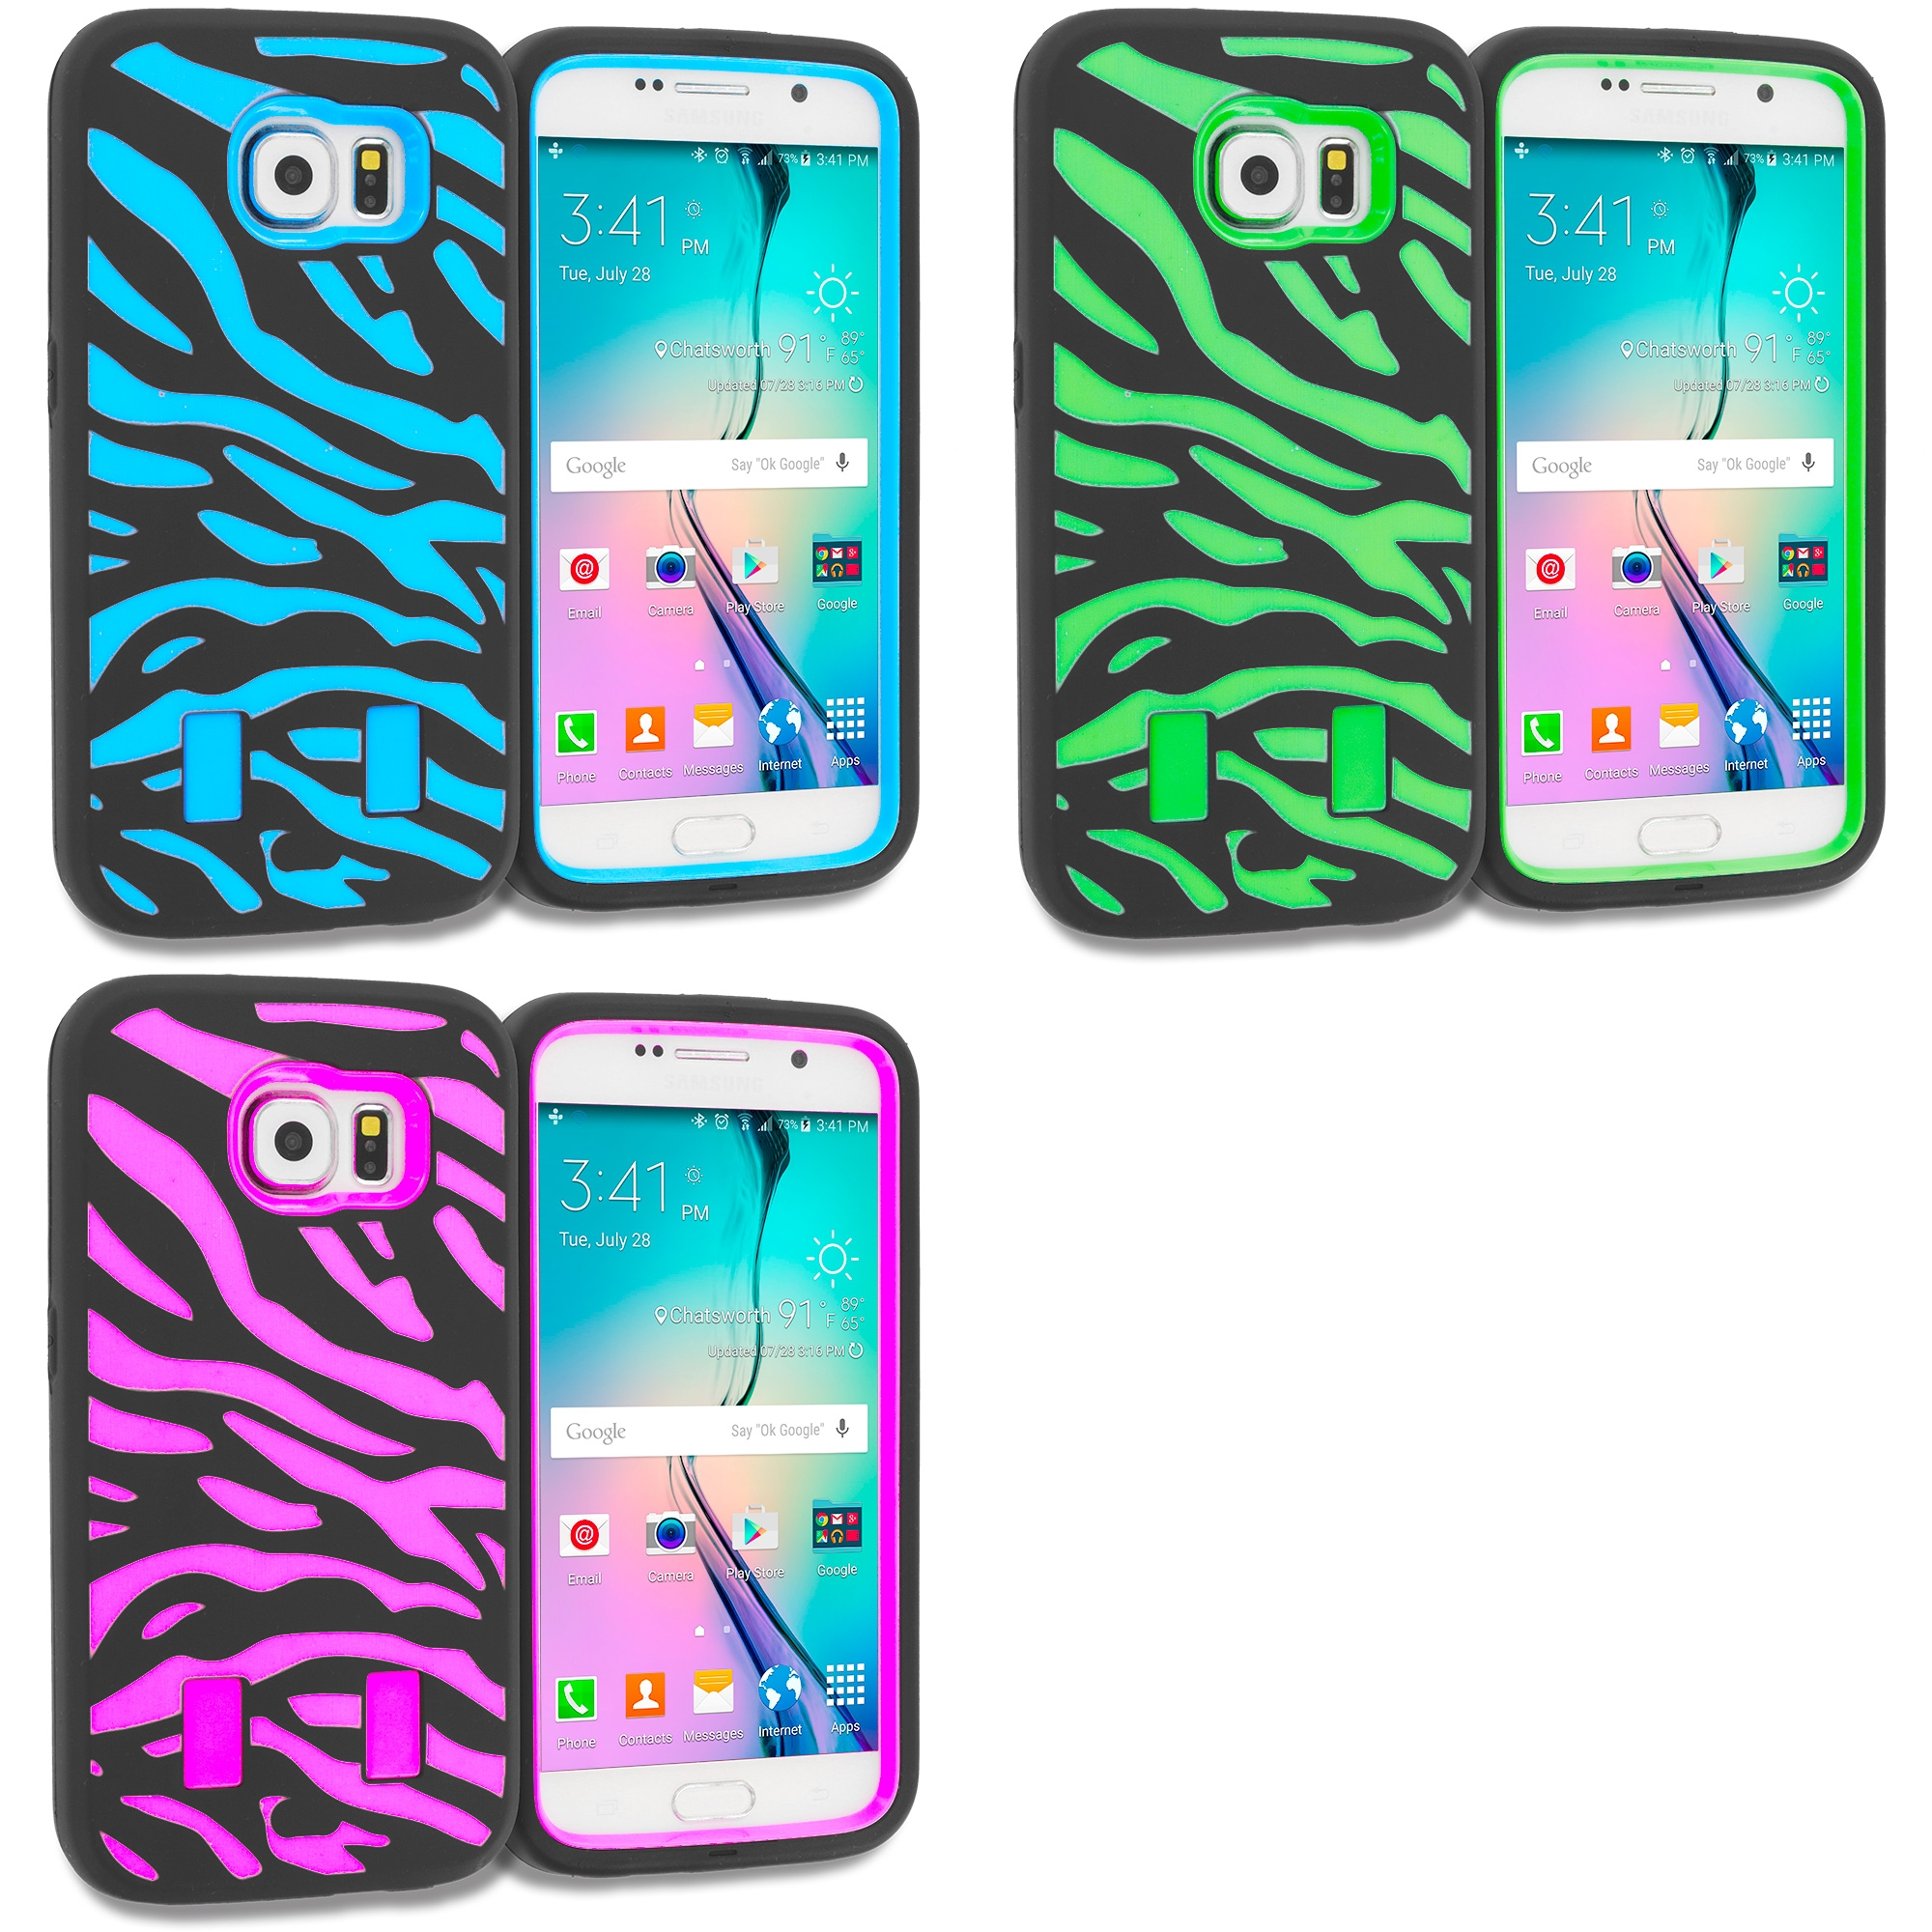 Samsung Galaxy S6 Combo Pack : Black Baby Blue Hybrid Zebra Hard/Soft Case Cover